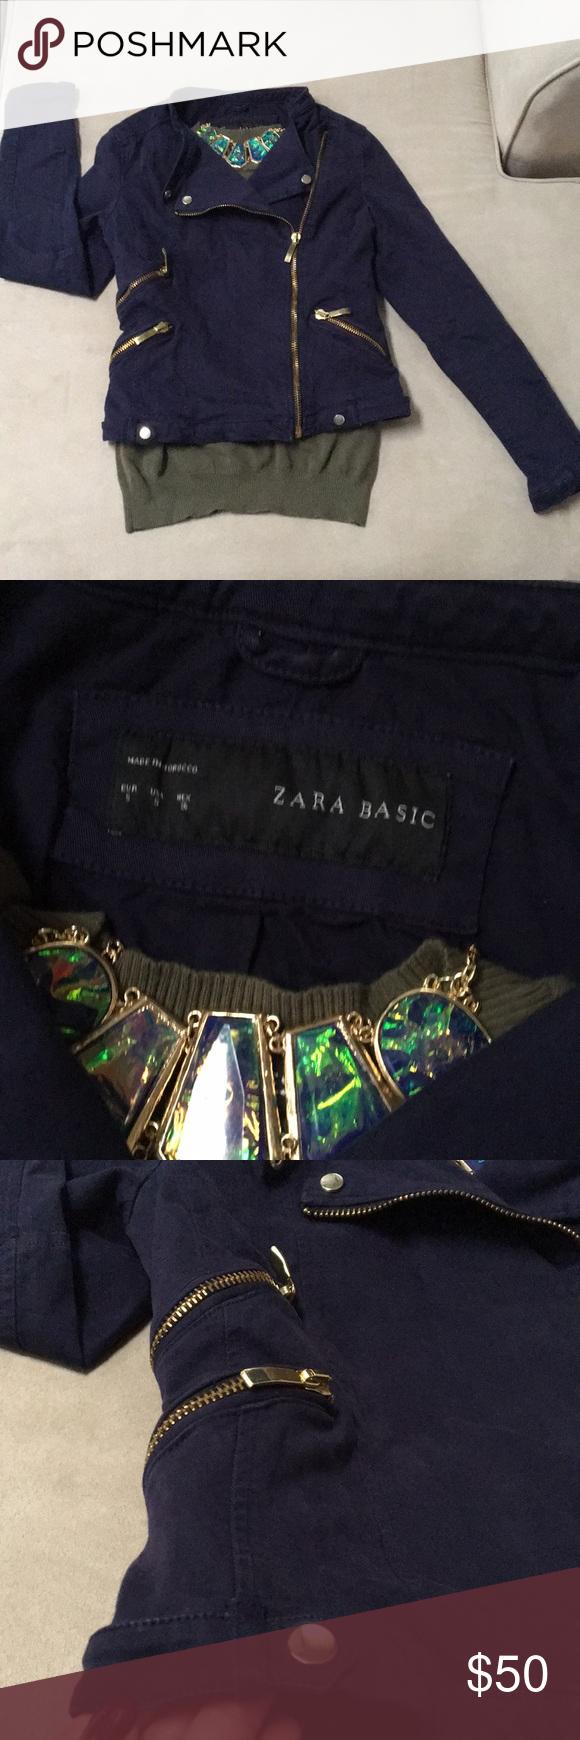 Zara biker jacket Super cool navy cotton biker jacket with